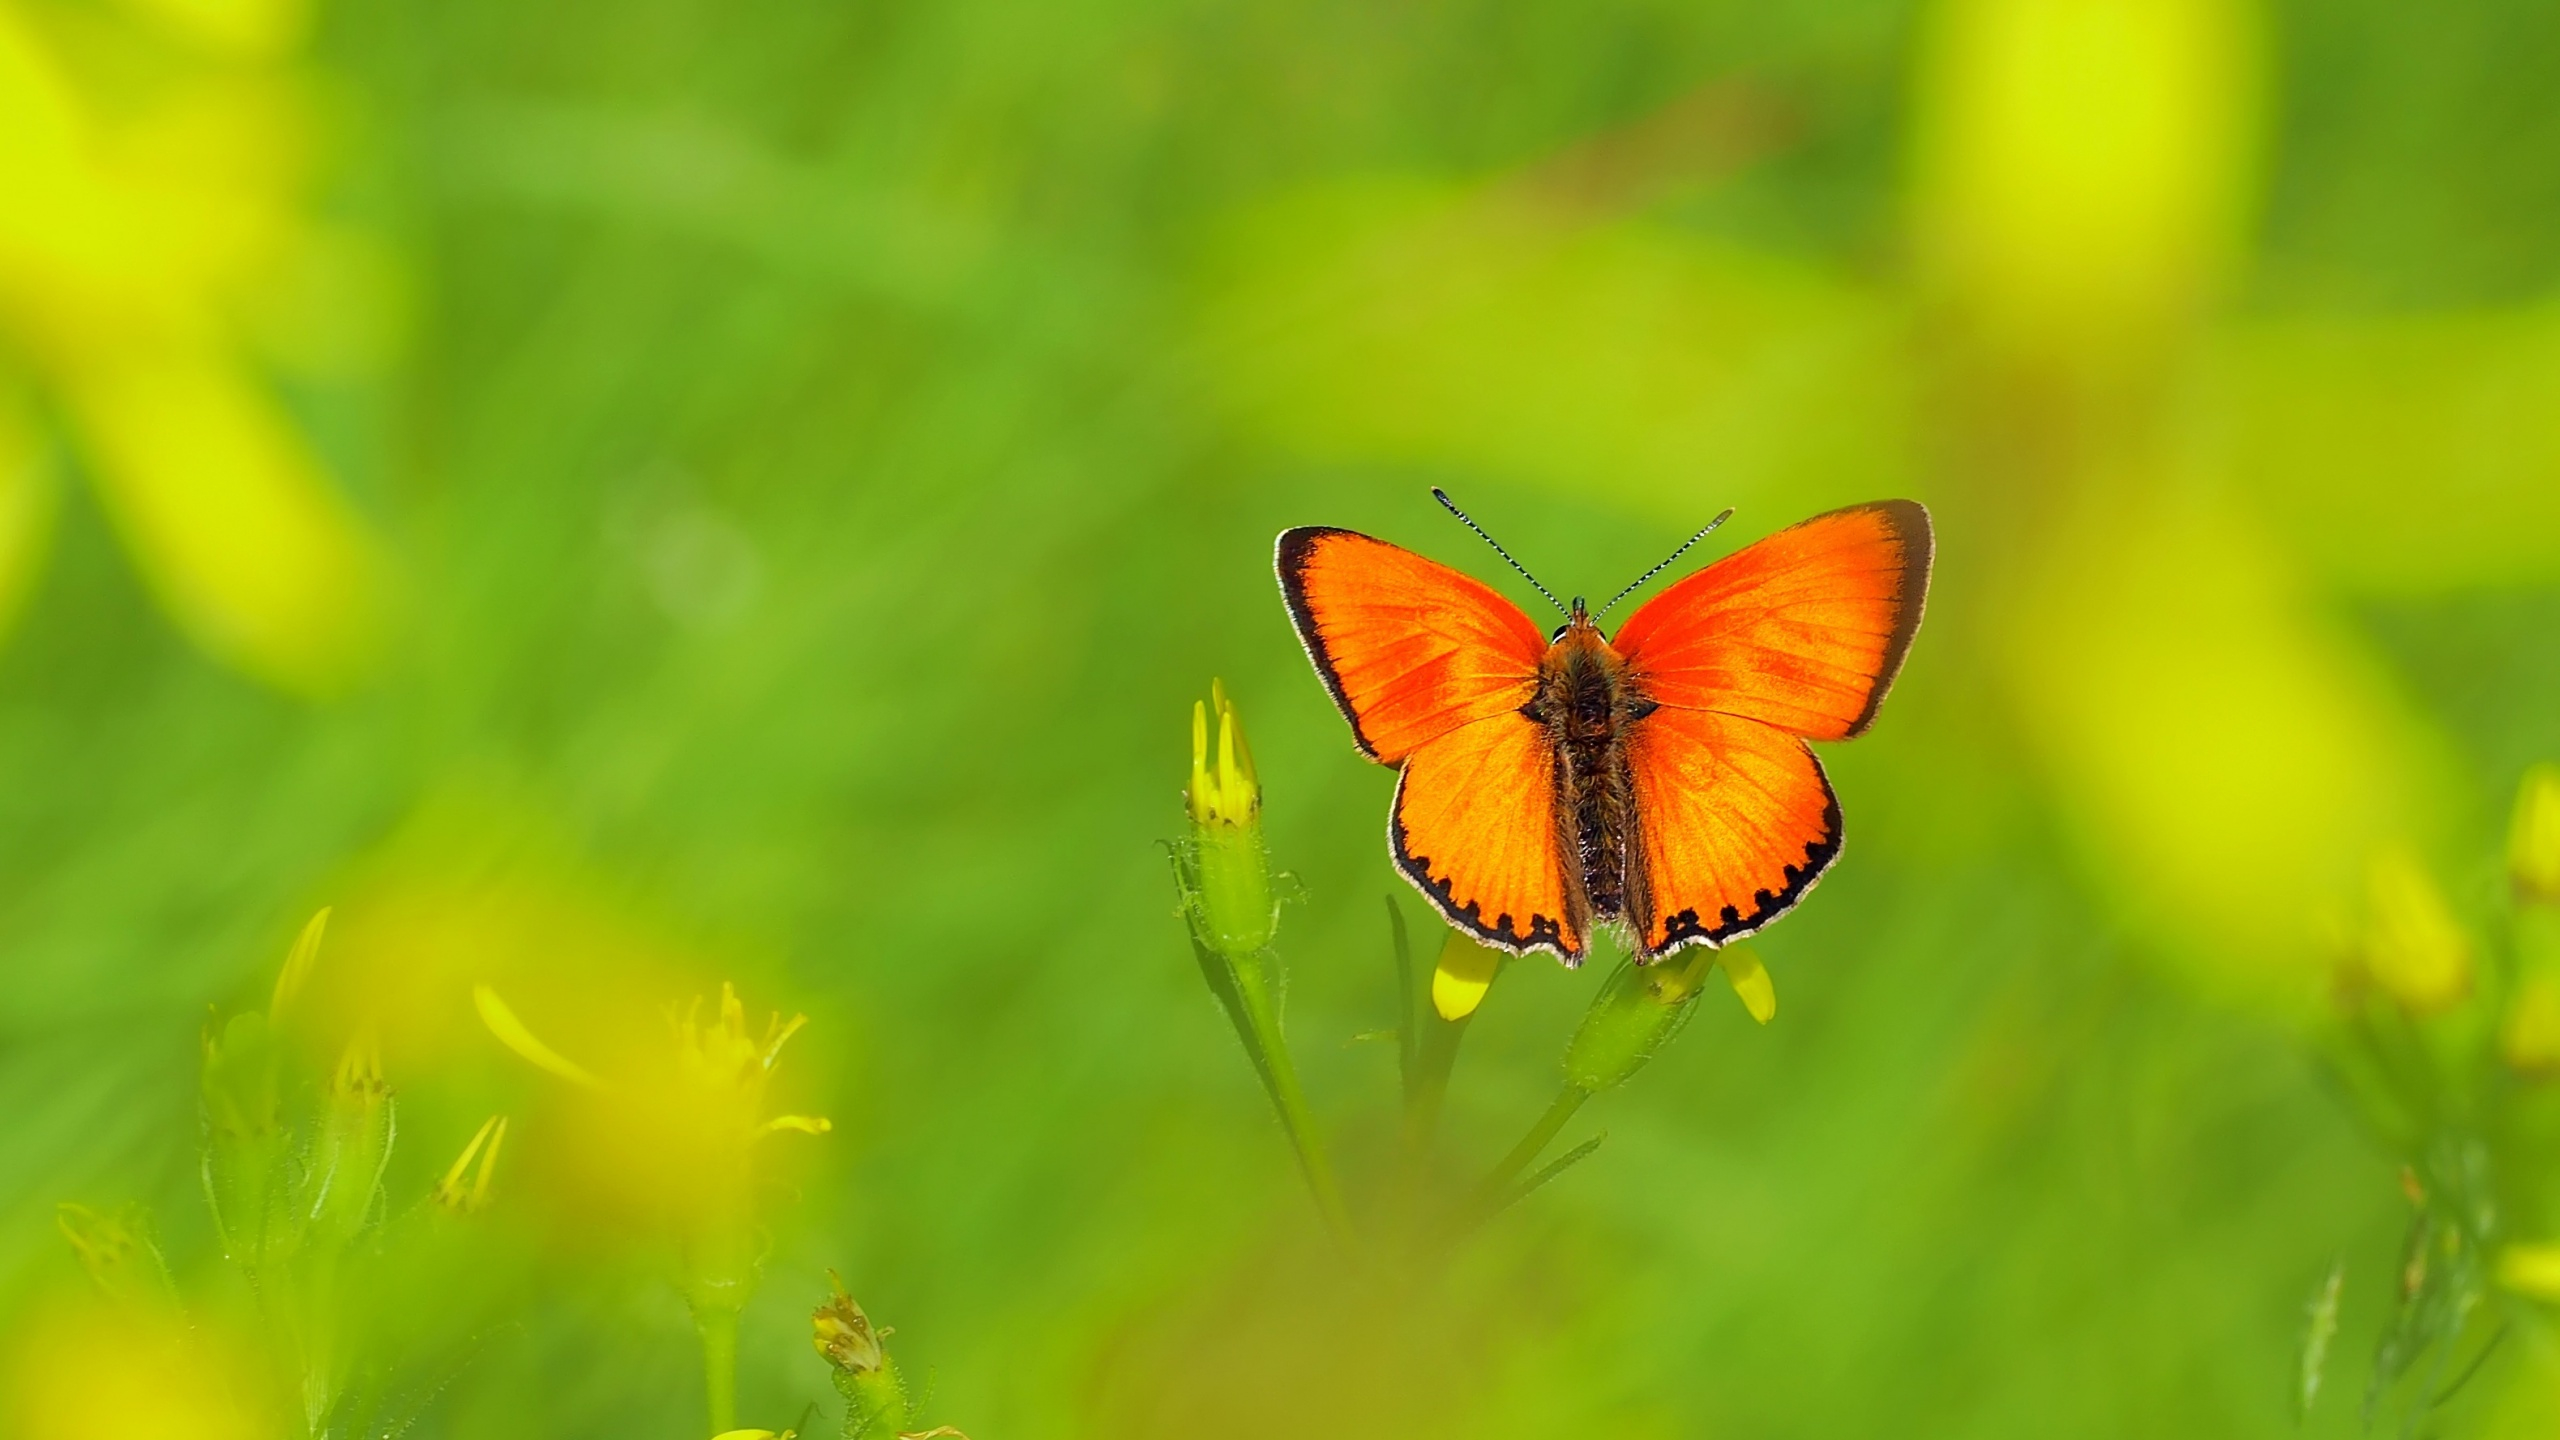 Orange Butterfly HD Wallpaper   Background Image ...